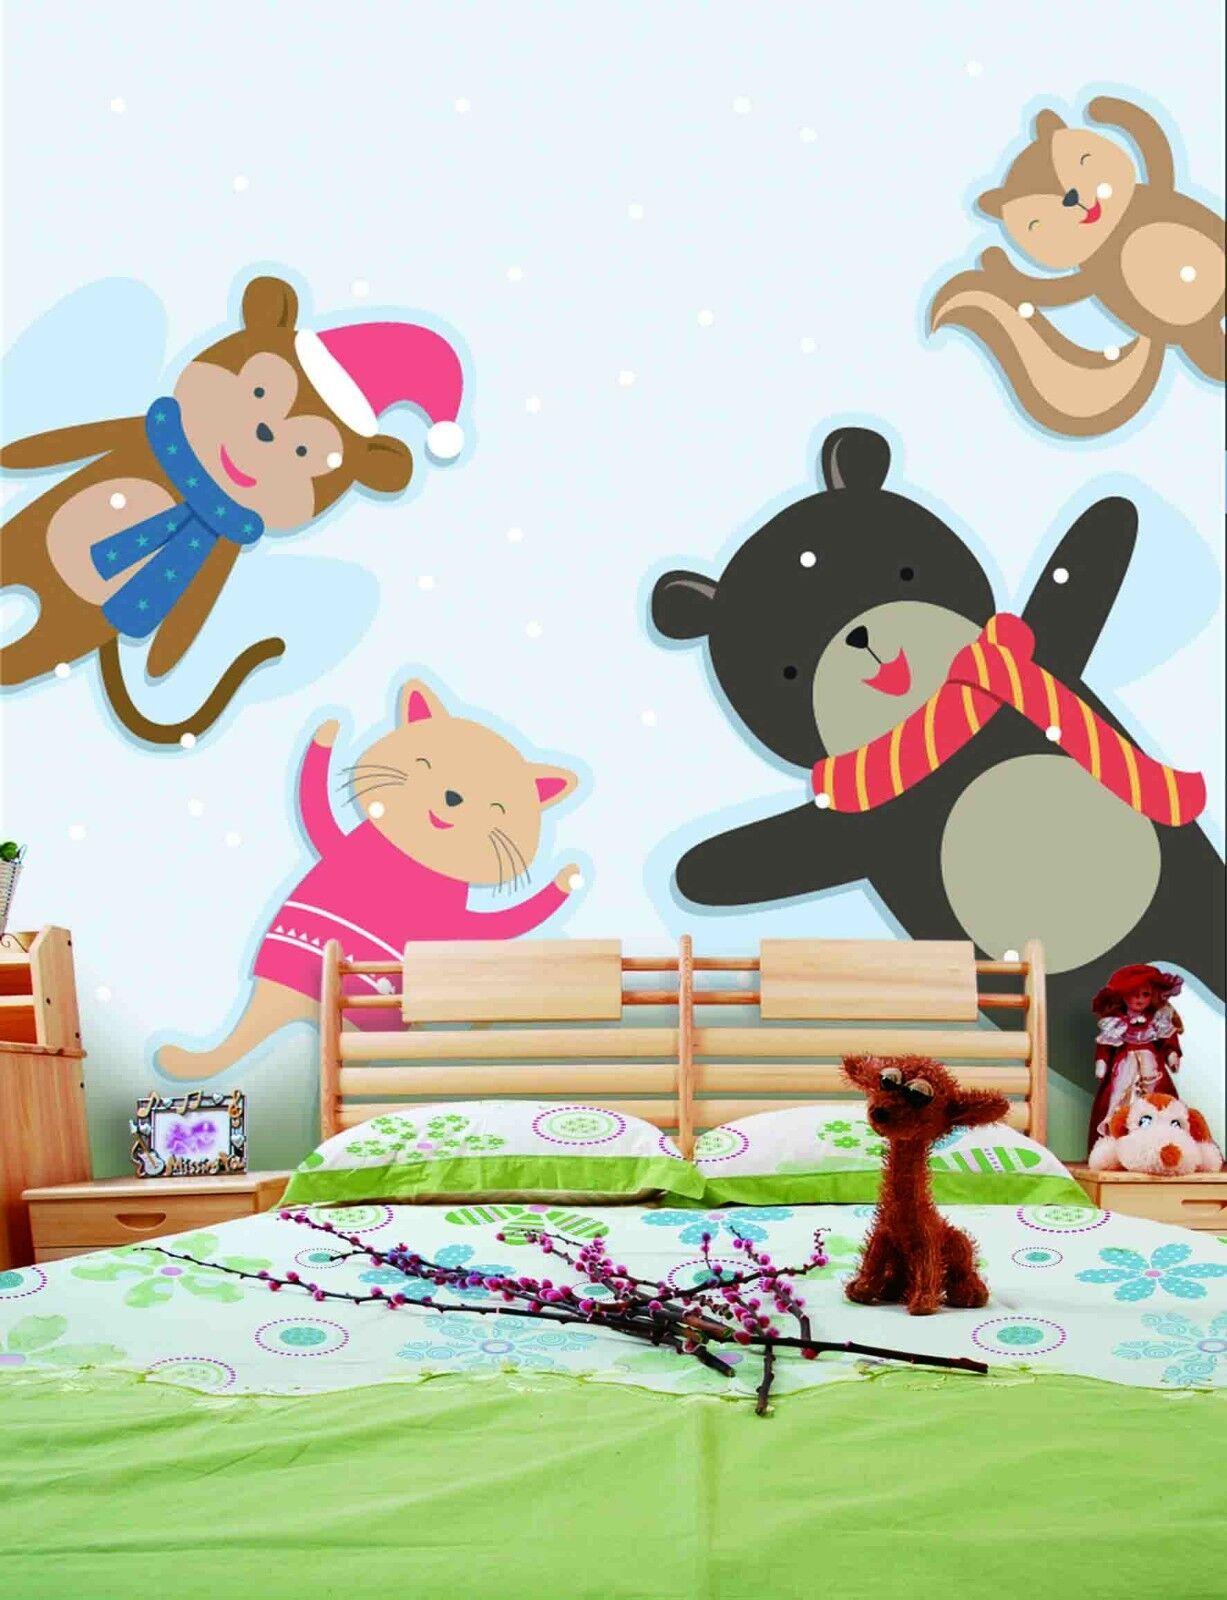 3D Cartoon Toy Animals 8 Wallpaper Mural Paper Wall Print Wallpaper Murals Lomen